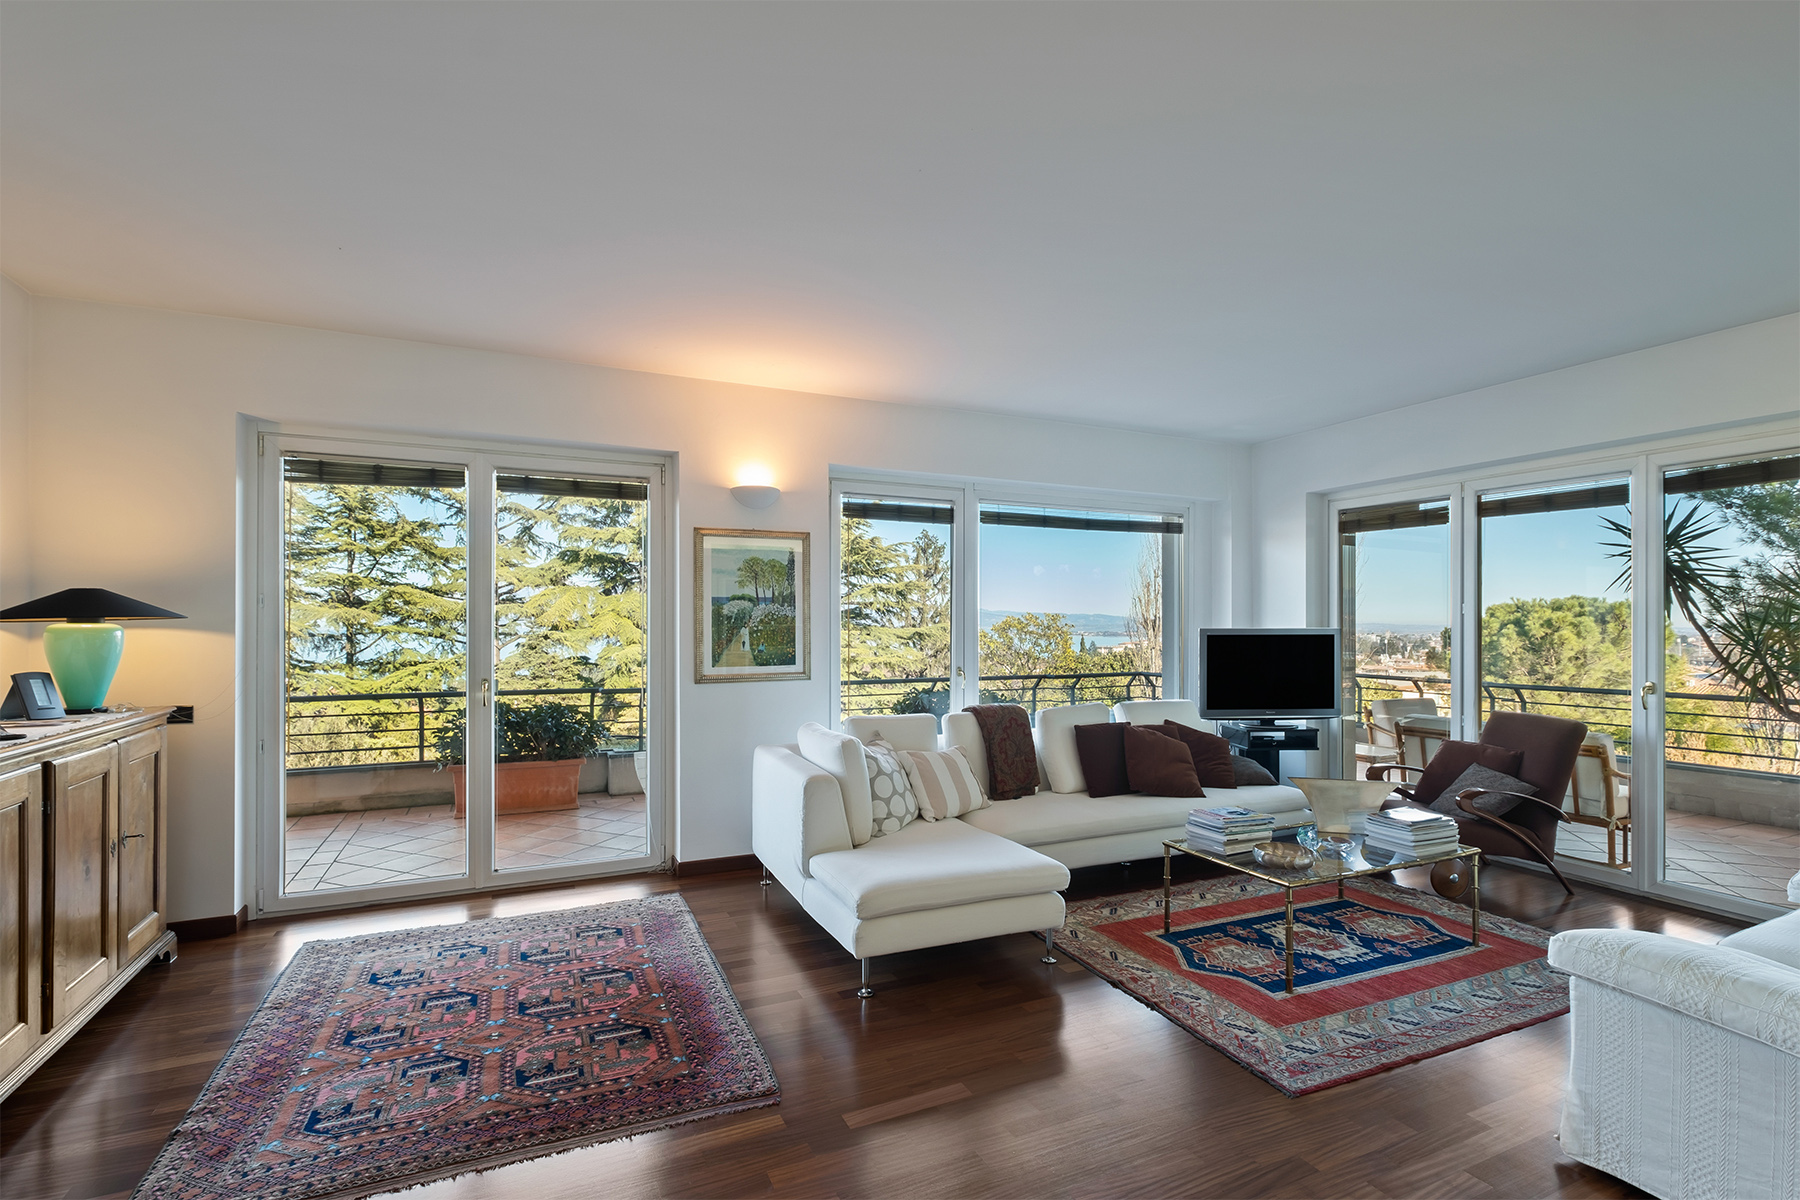 Apartments for Sale at Bright apartment overlooking Lake Garda Desenzano Del Garda, Brescia Italy